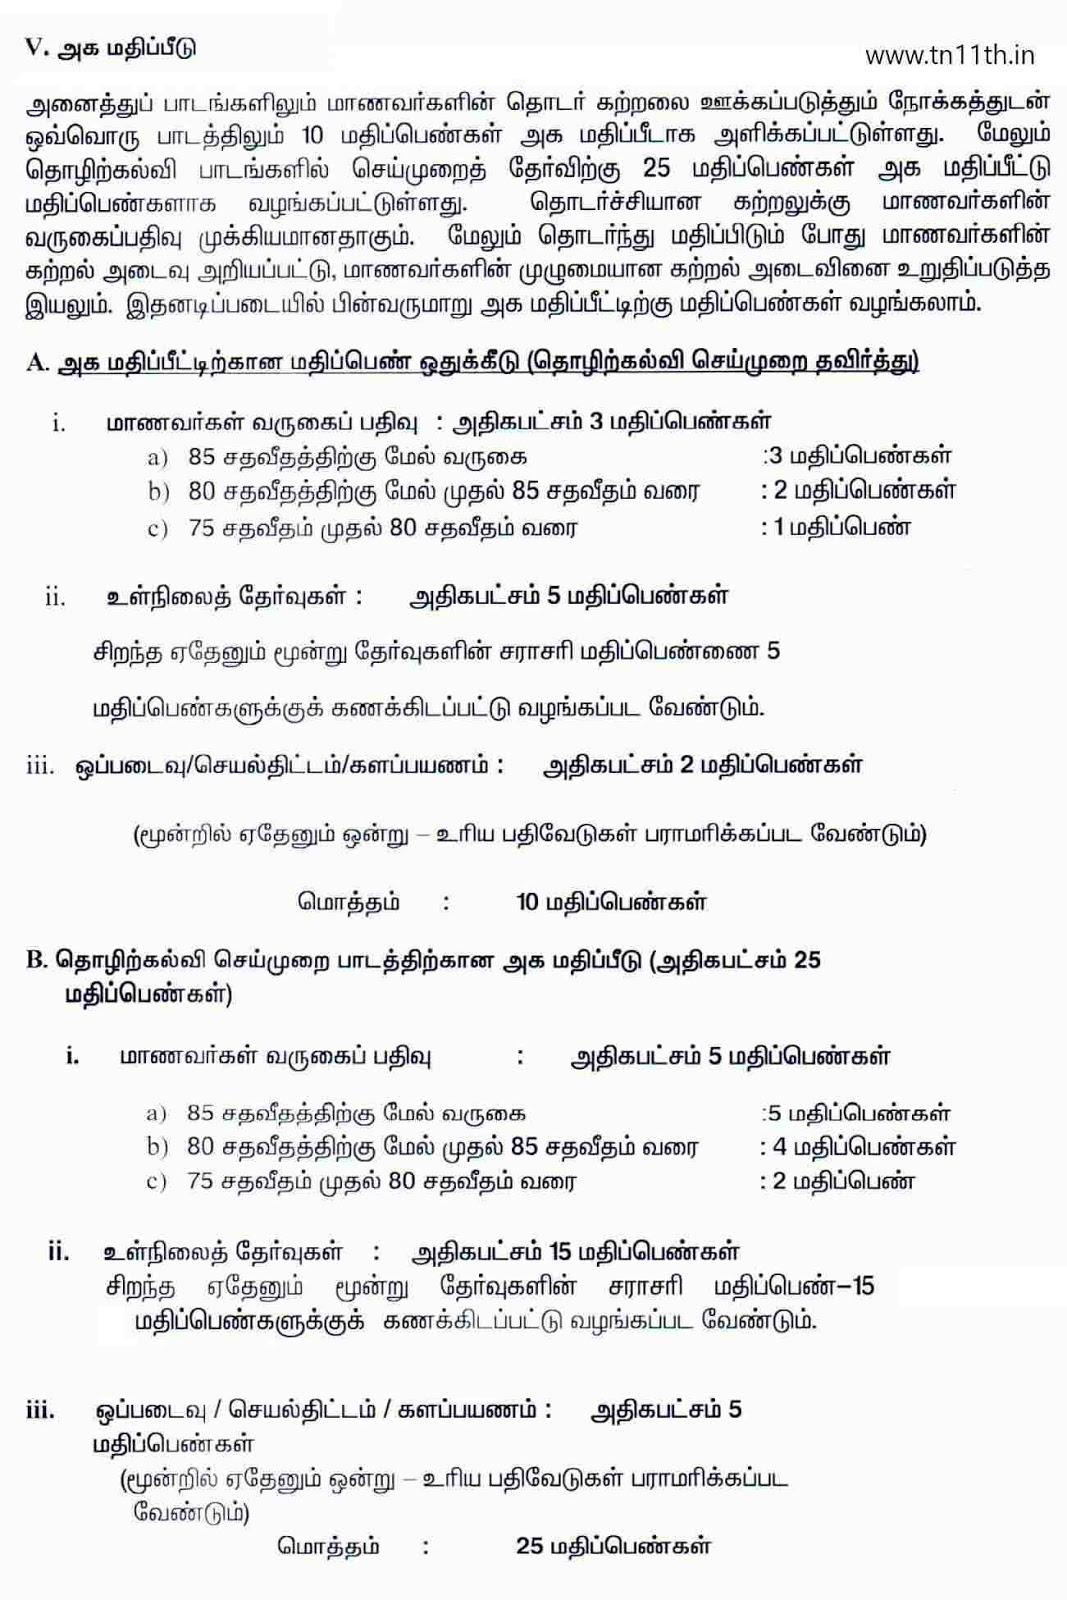 Tamilnadu 11th blueprint 2018 tn plus one 1 new blue print note new corrections in internal marks malvernweather Gallery